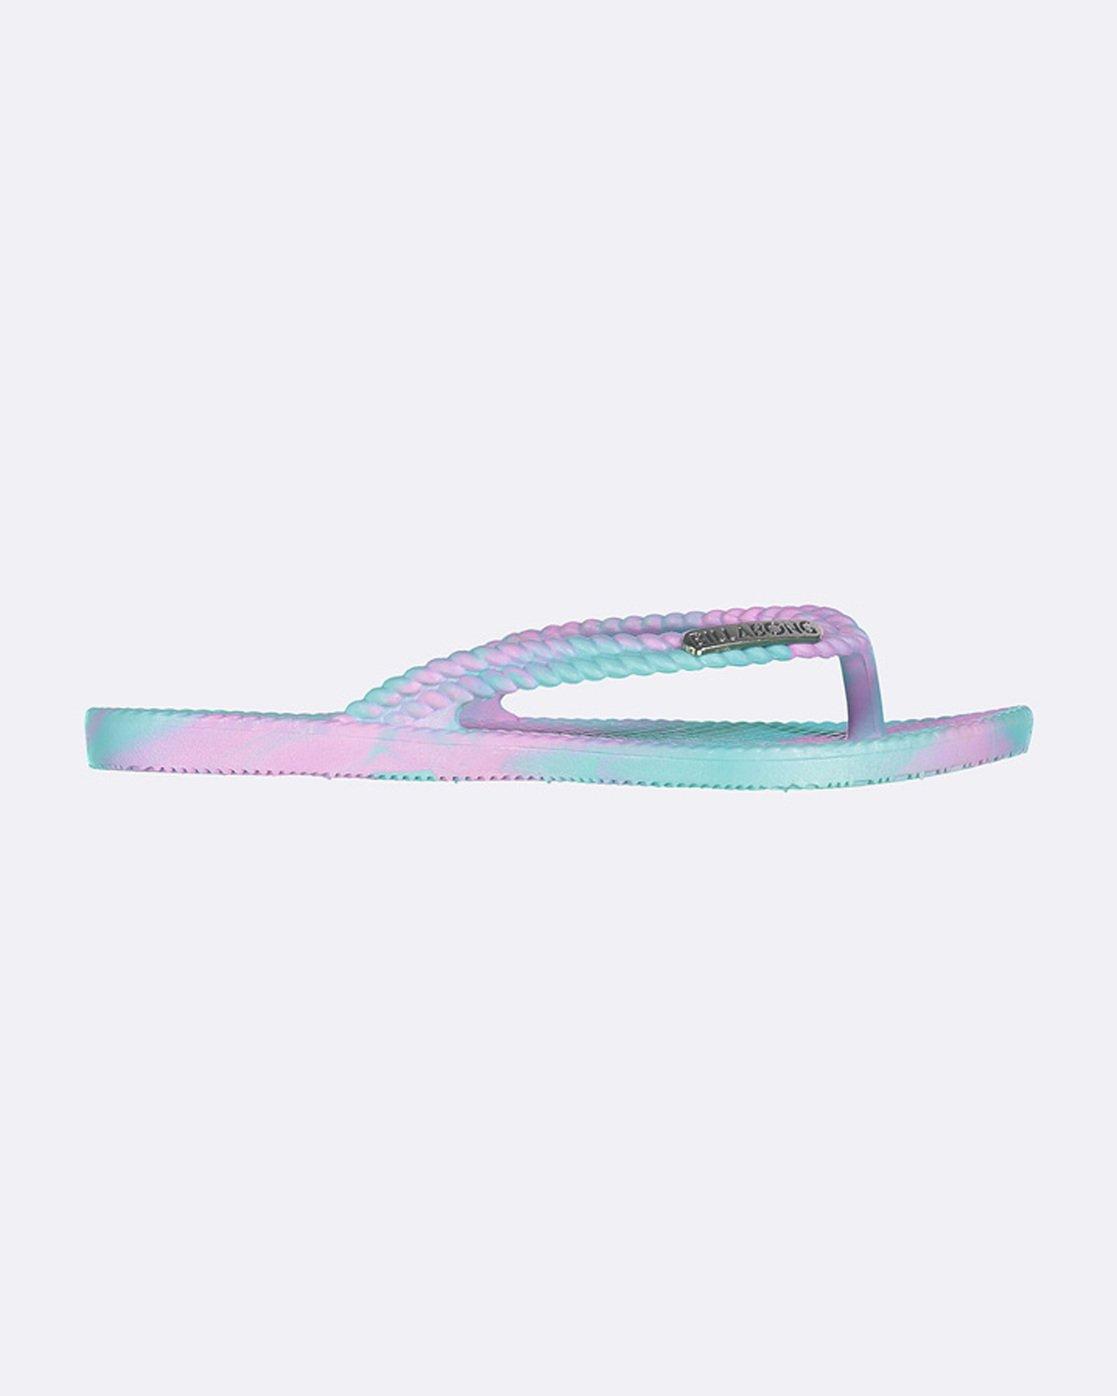 BILLABONG NEW Teen Girls FlipFlops Thongs Sandals KICKS marble mermaid Surf Logo